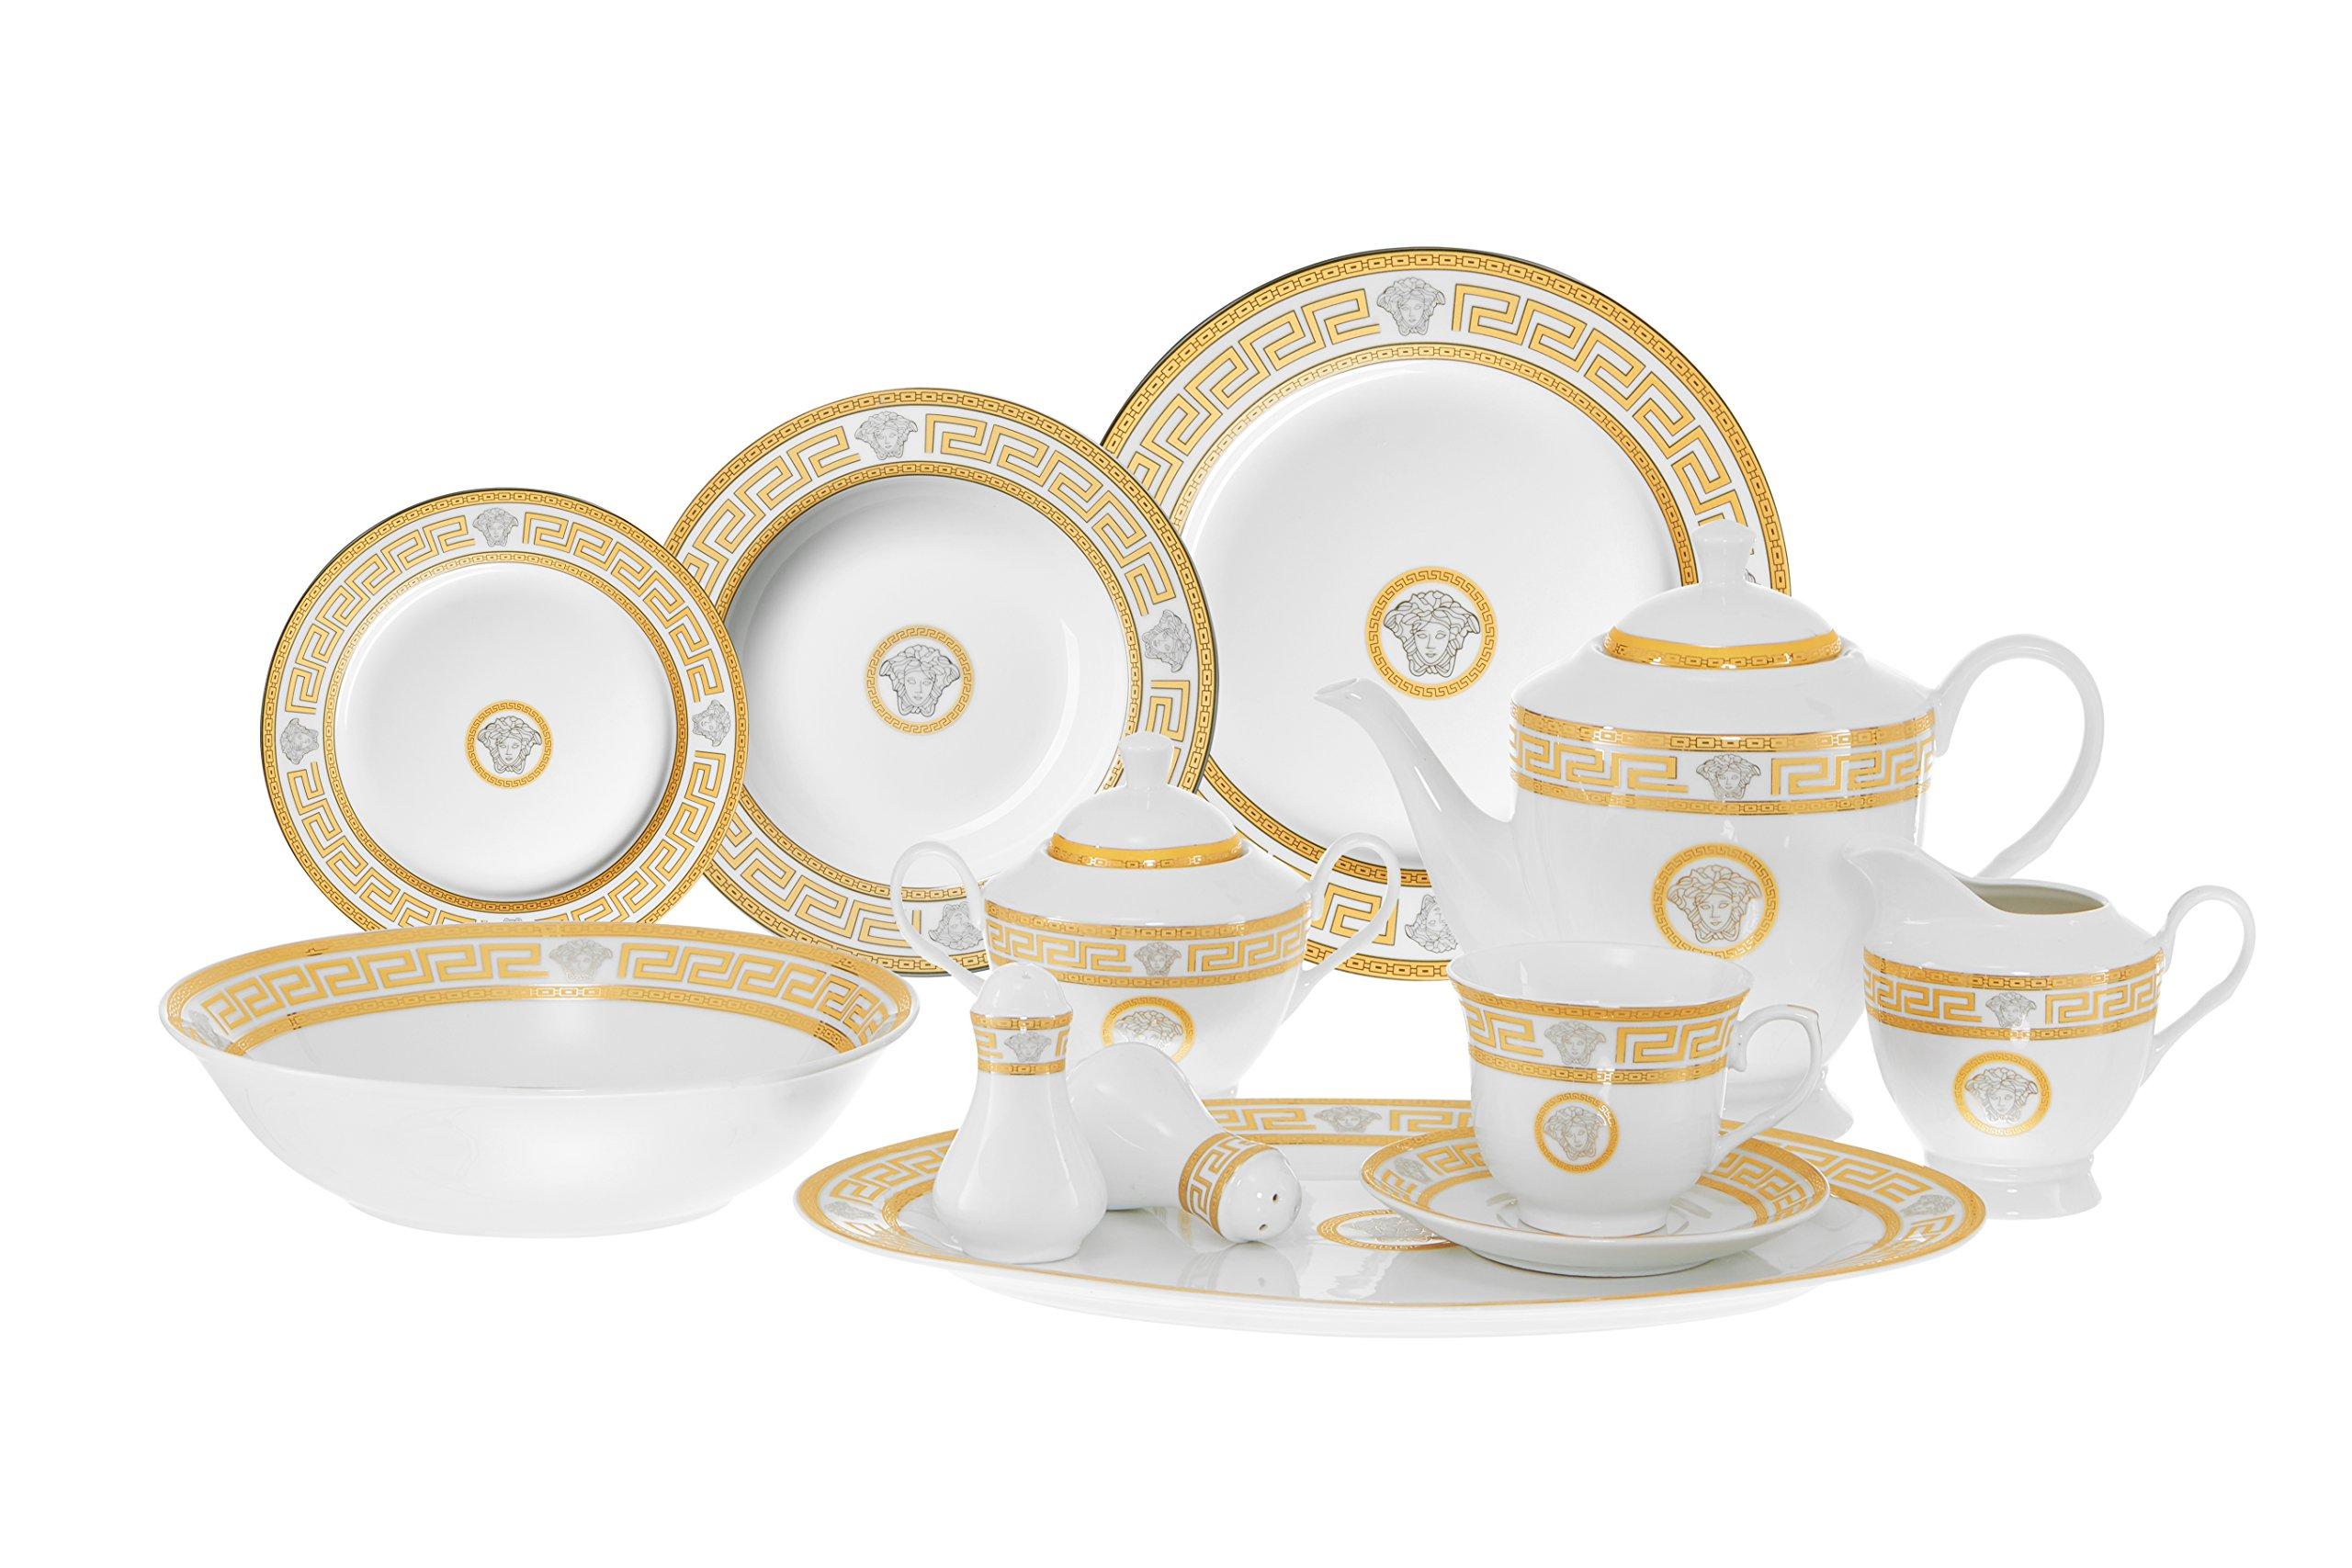 Italian Style Greek Key 49 Piece Porcelain Dinnerware Set Service for 8 - Gold